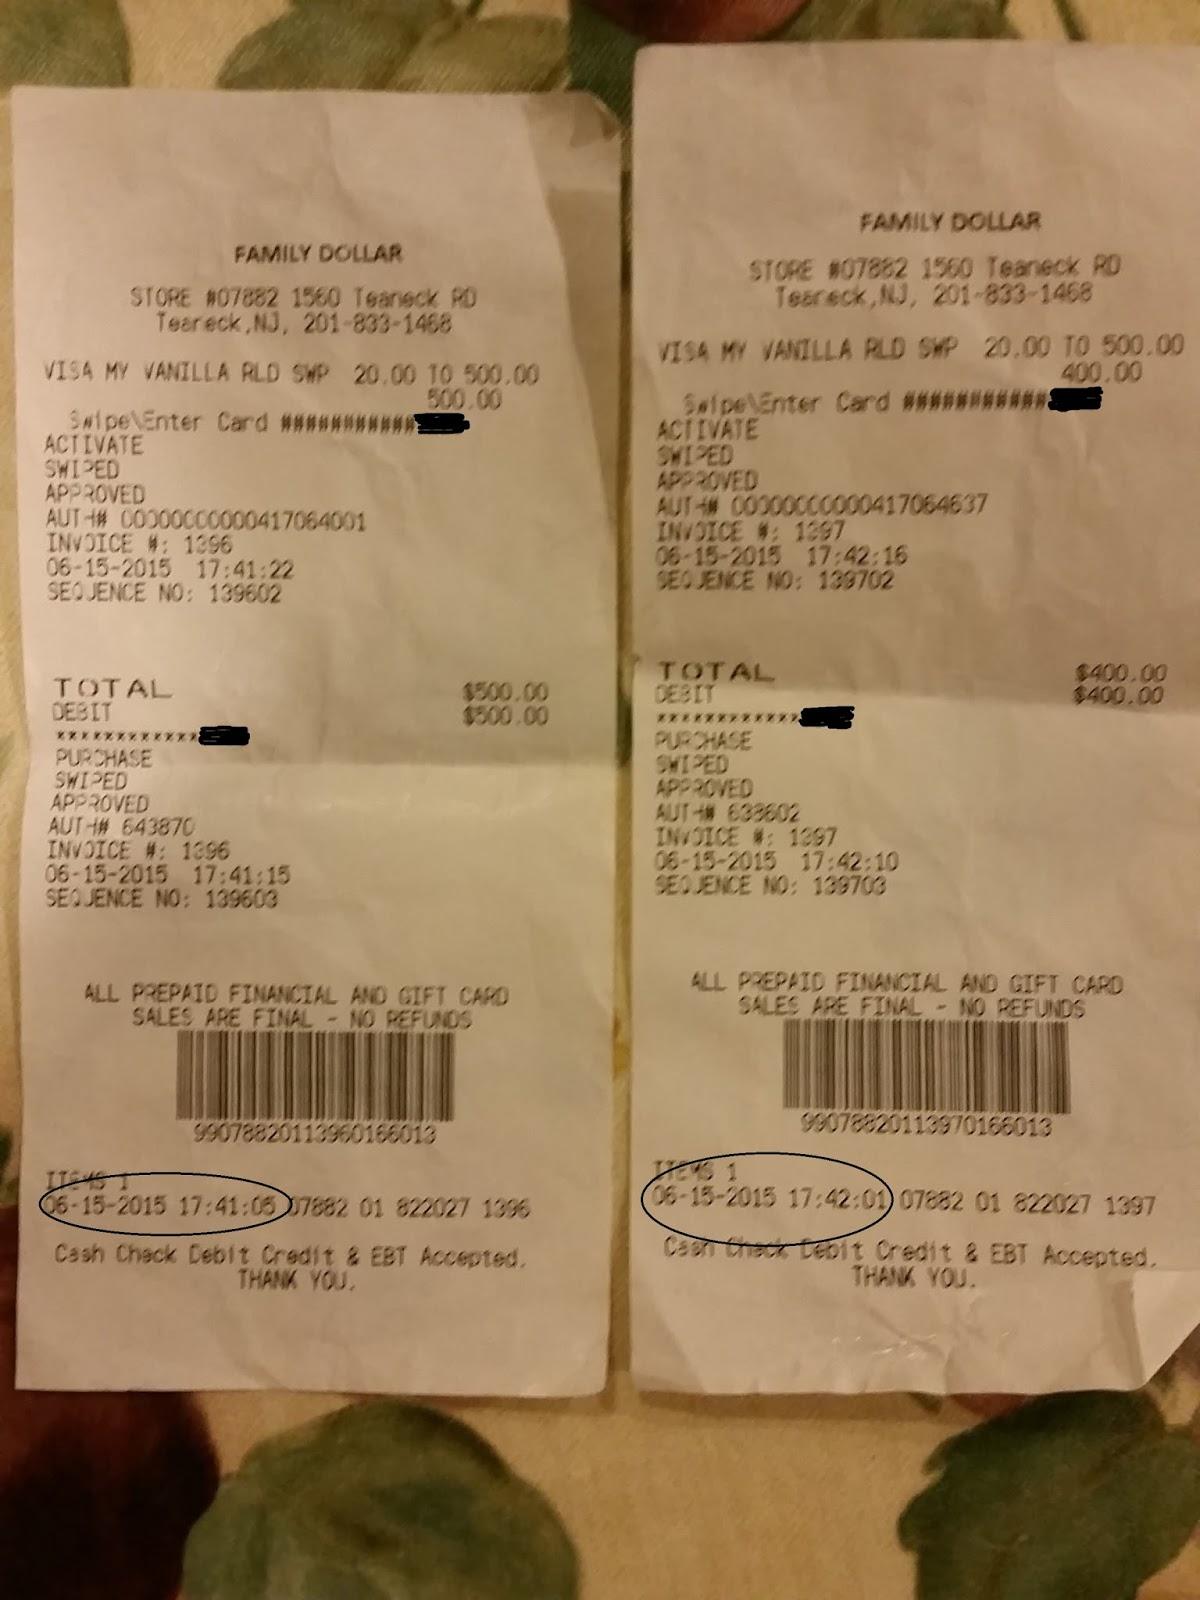 Oren S Money Saver Serve Reloads At Family Dollar 500 Per Store Is Not The Maximum